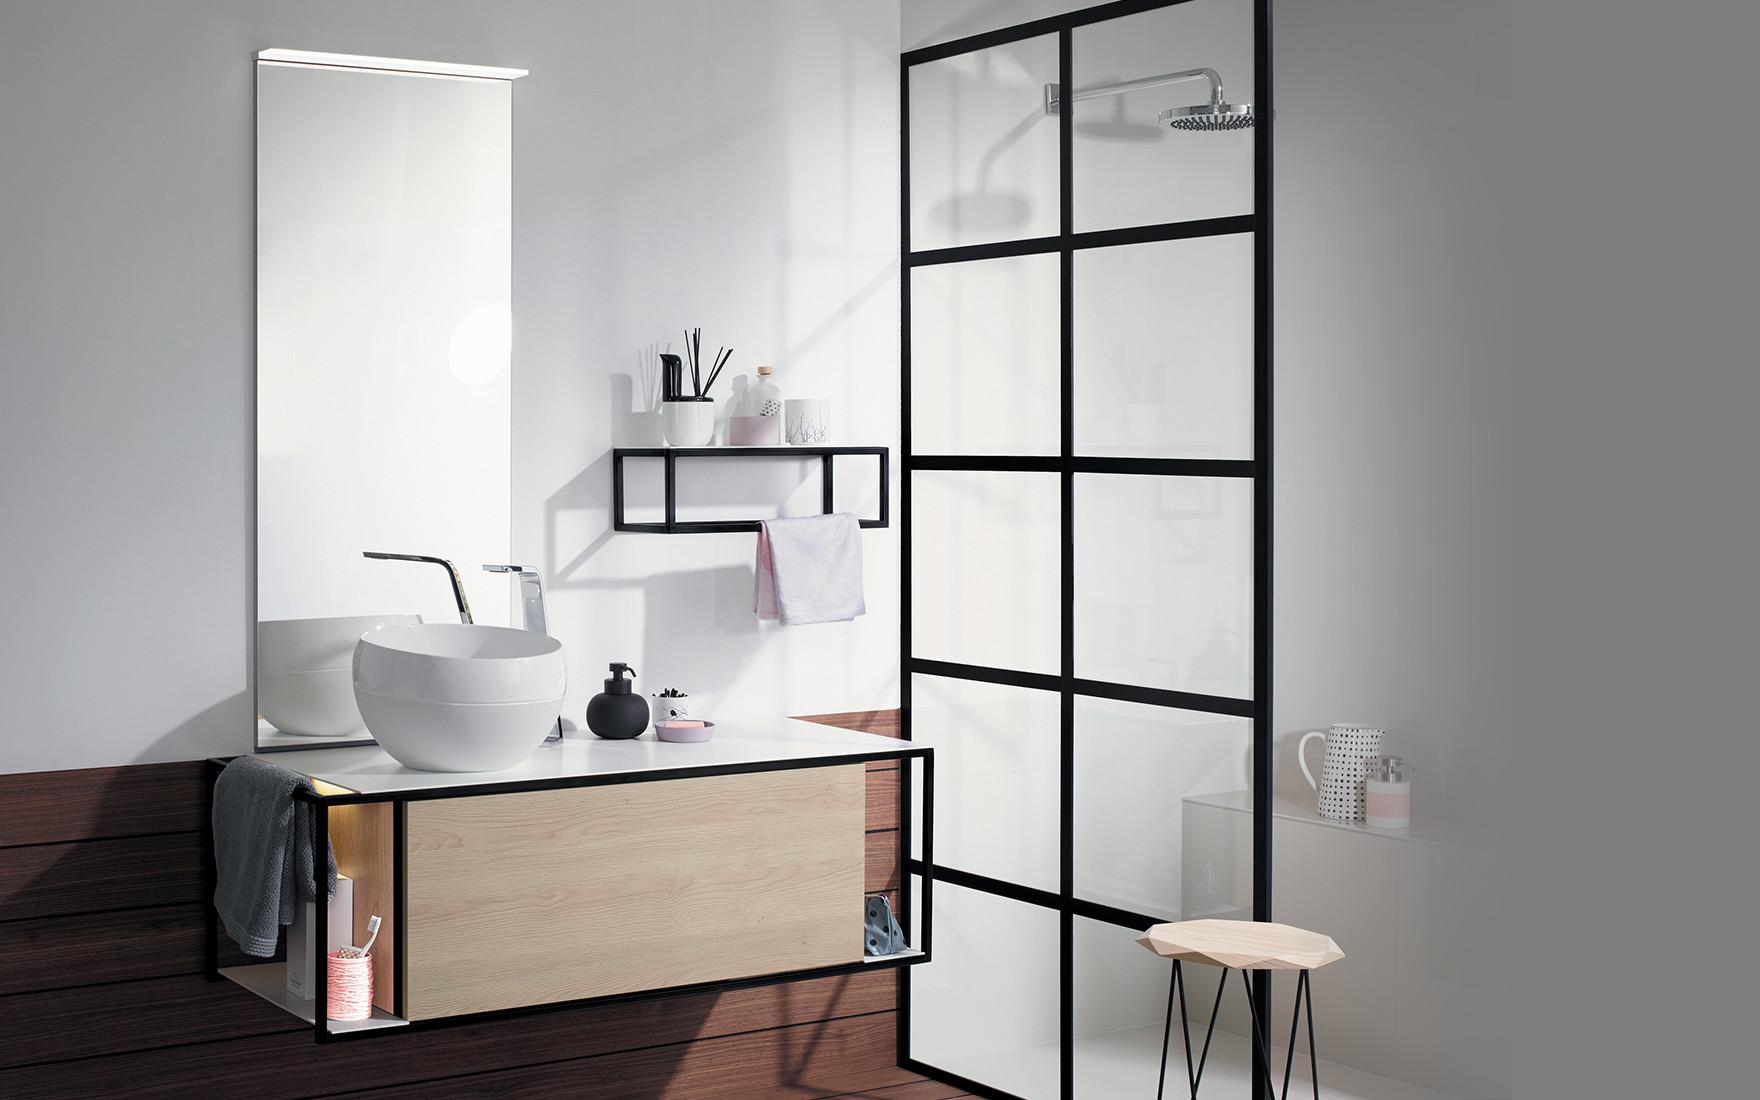 projet-salle-de-bain-1